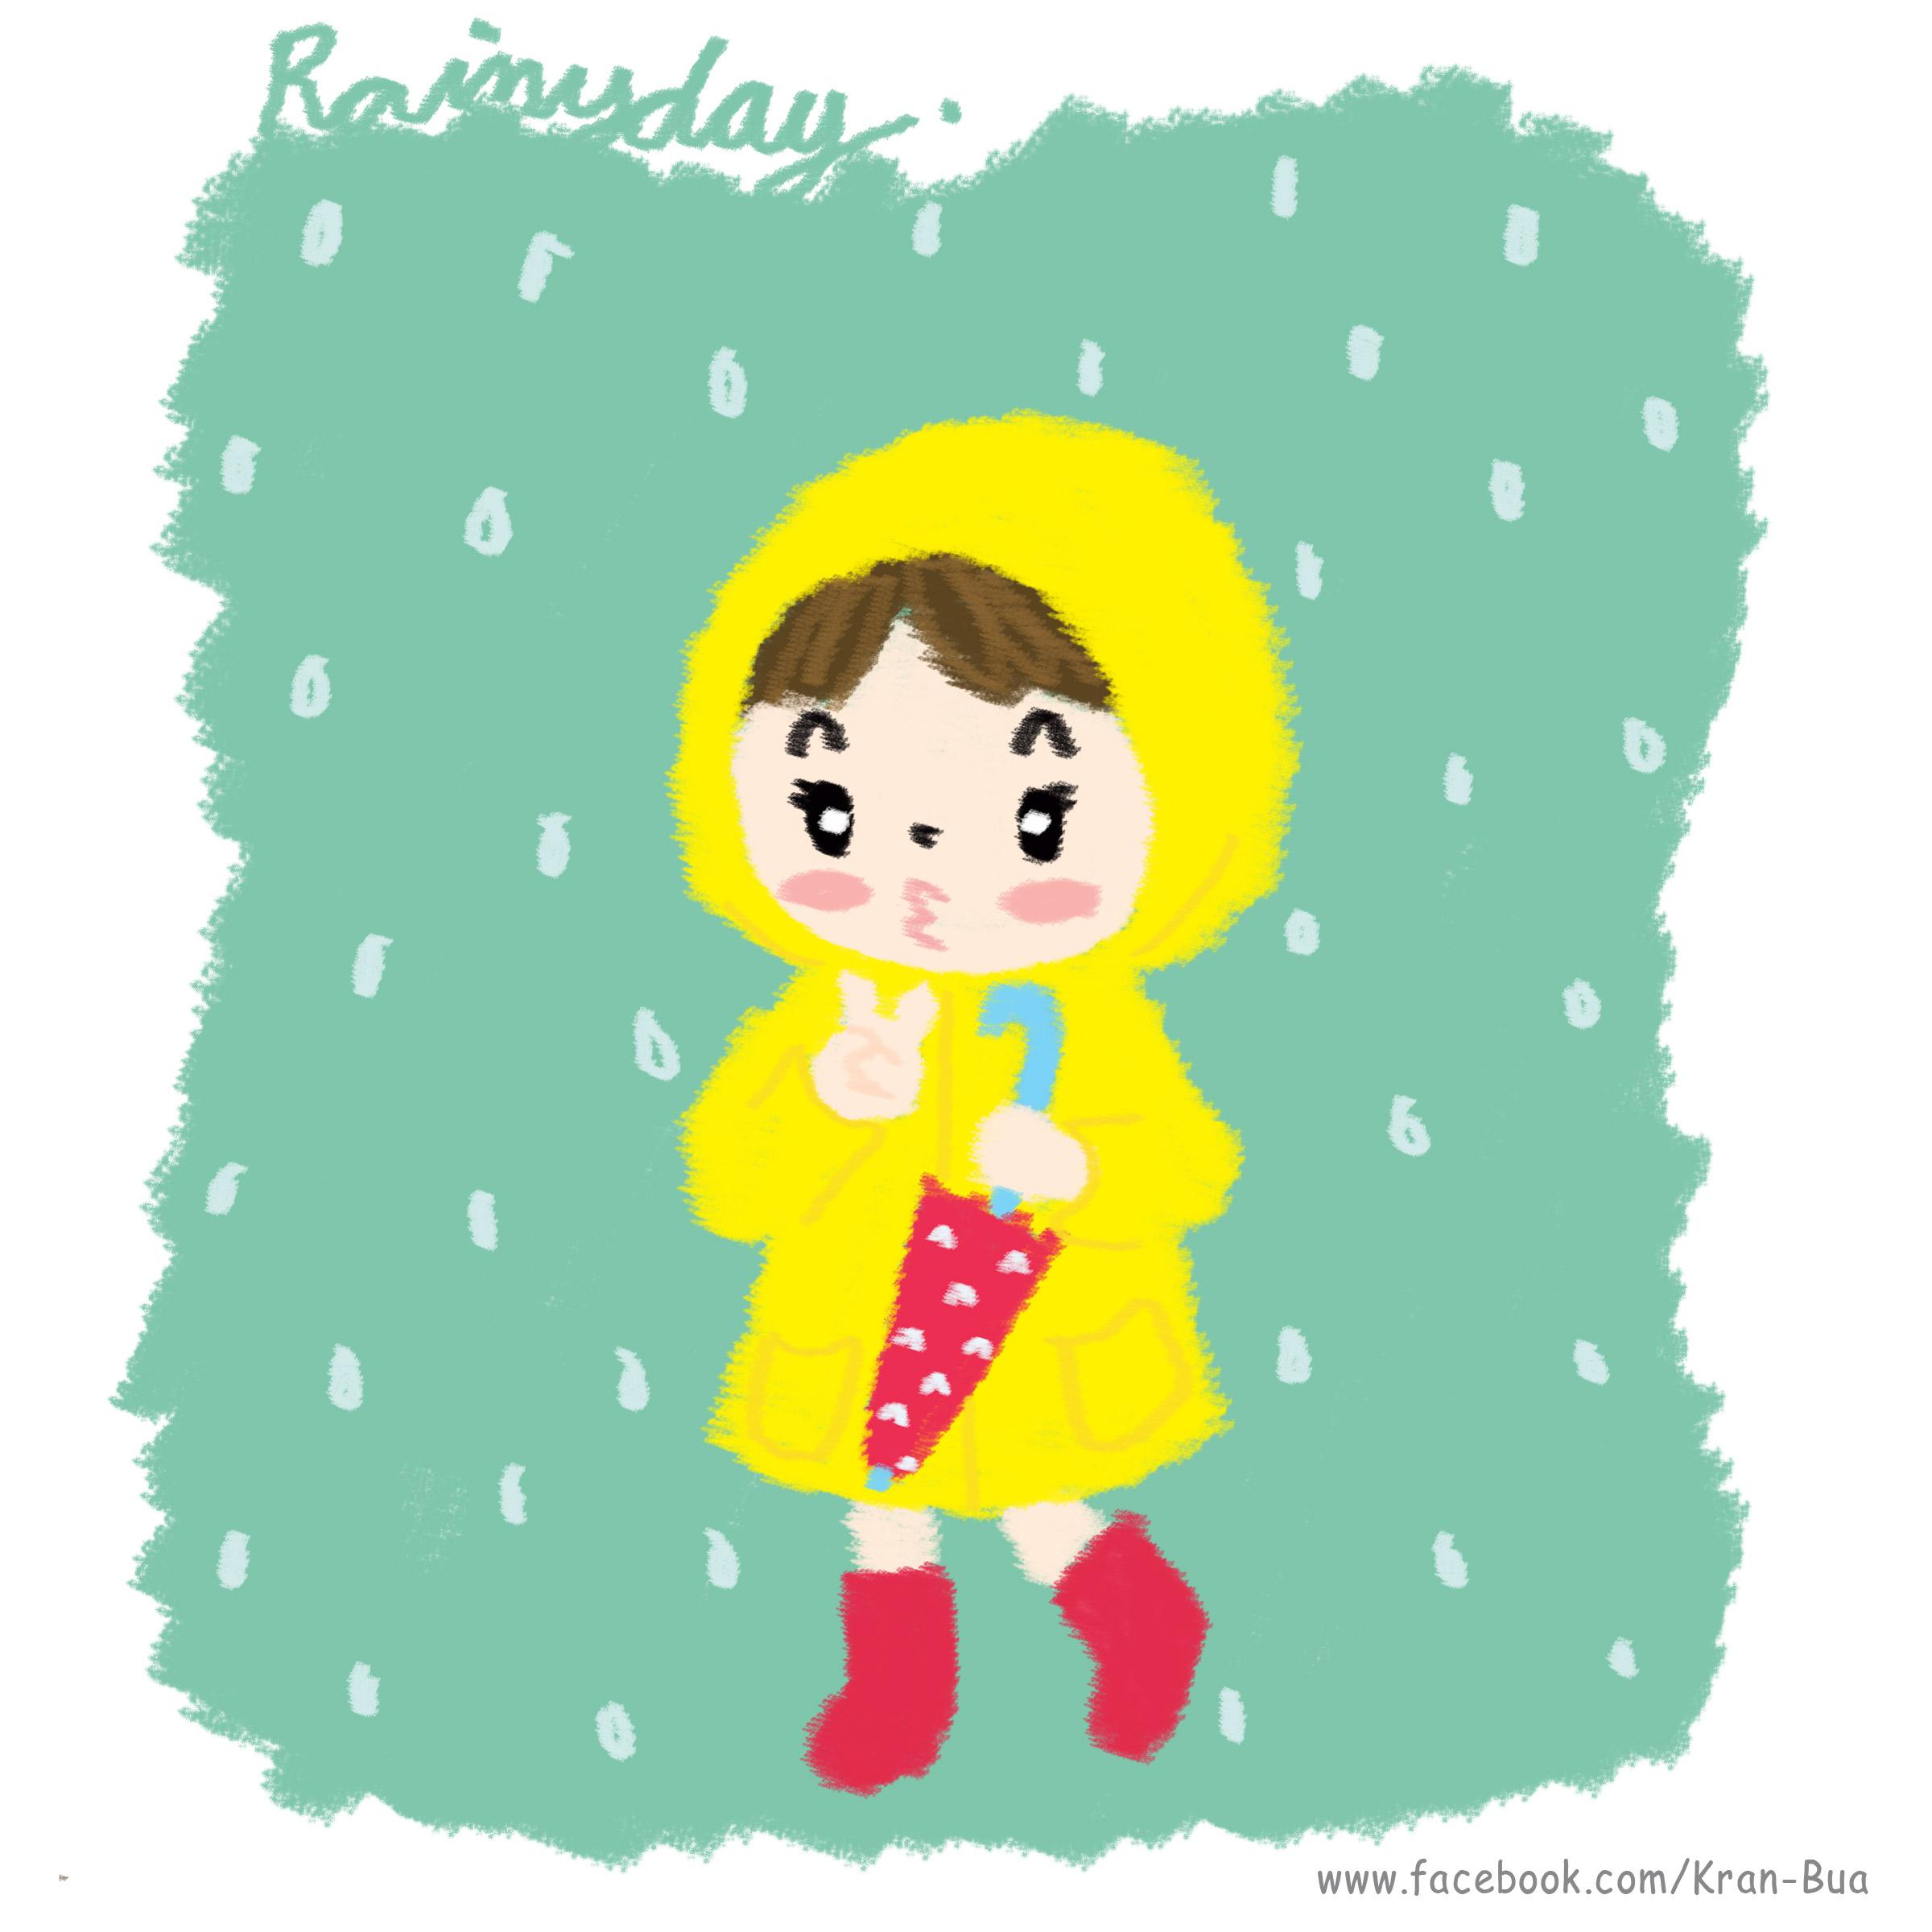 2400x2400 A Rainy Day.